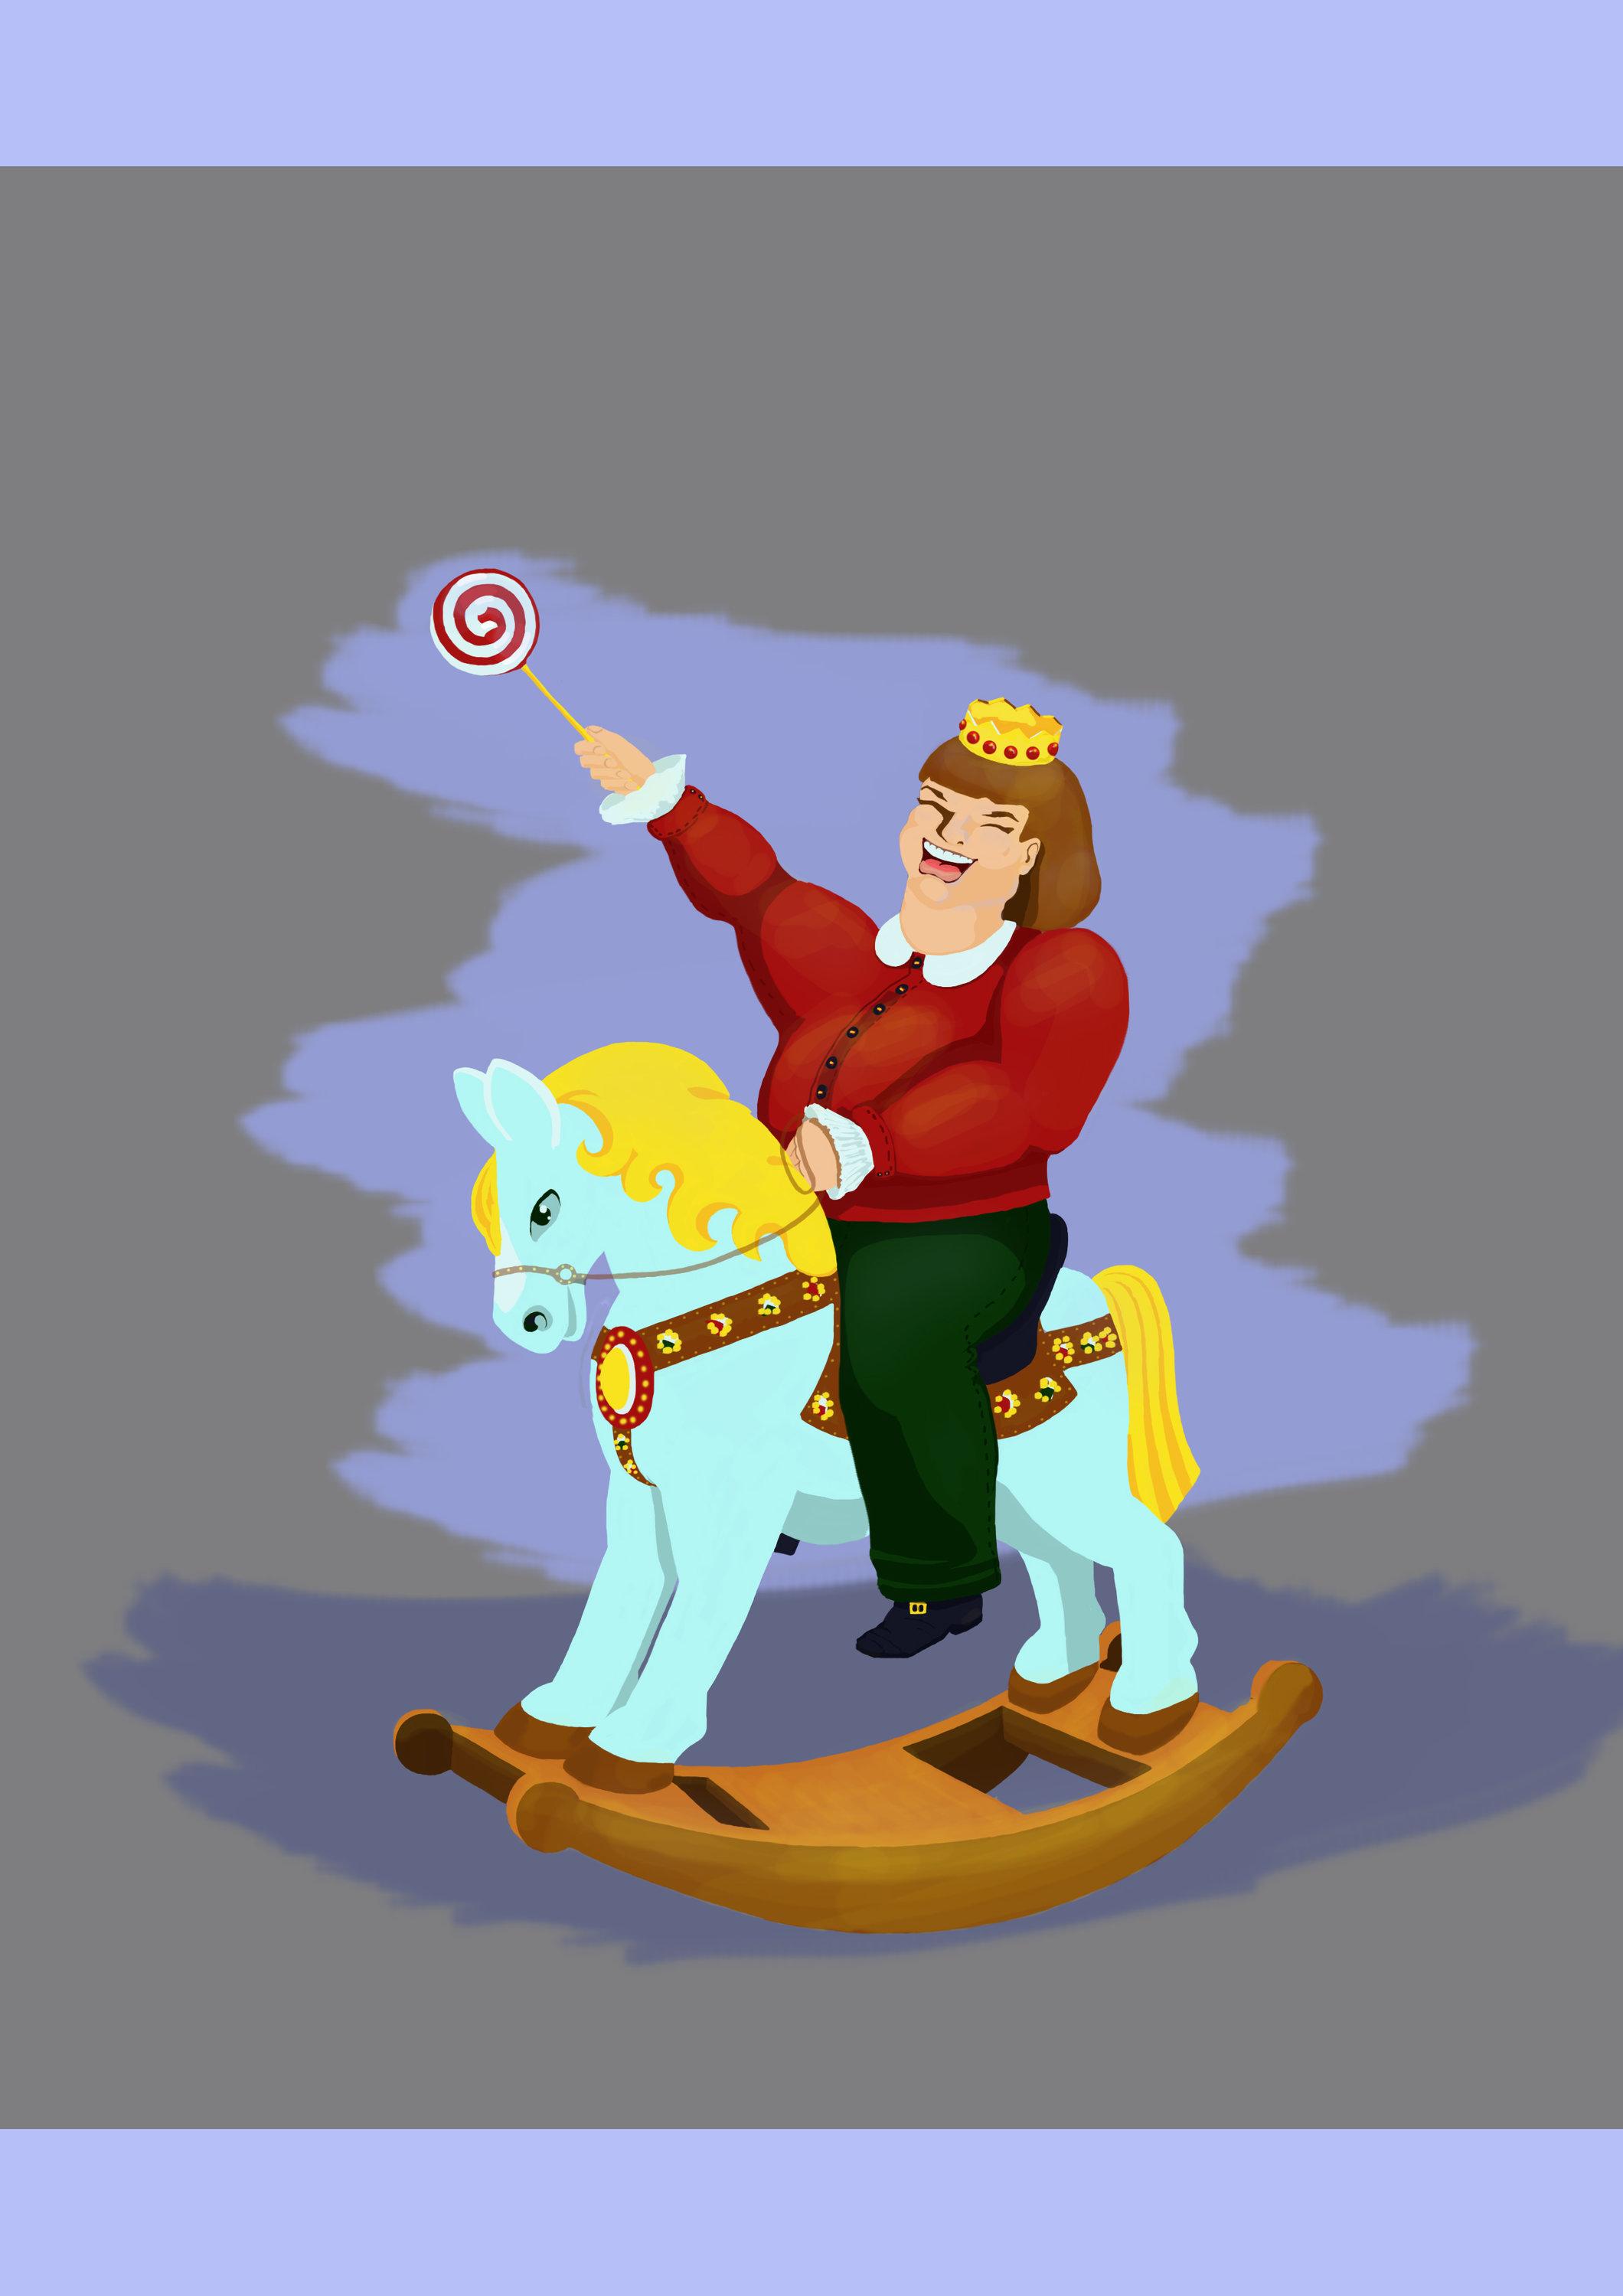 король на коне3.jpg